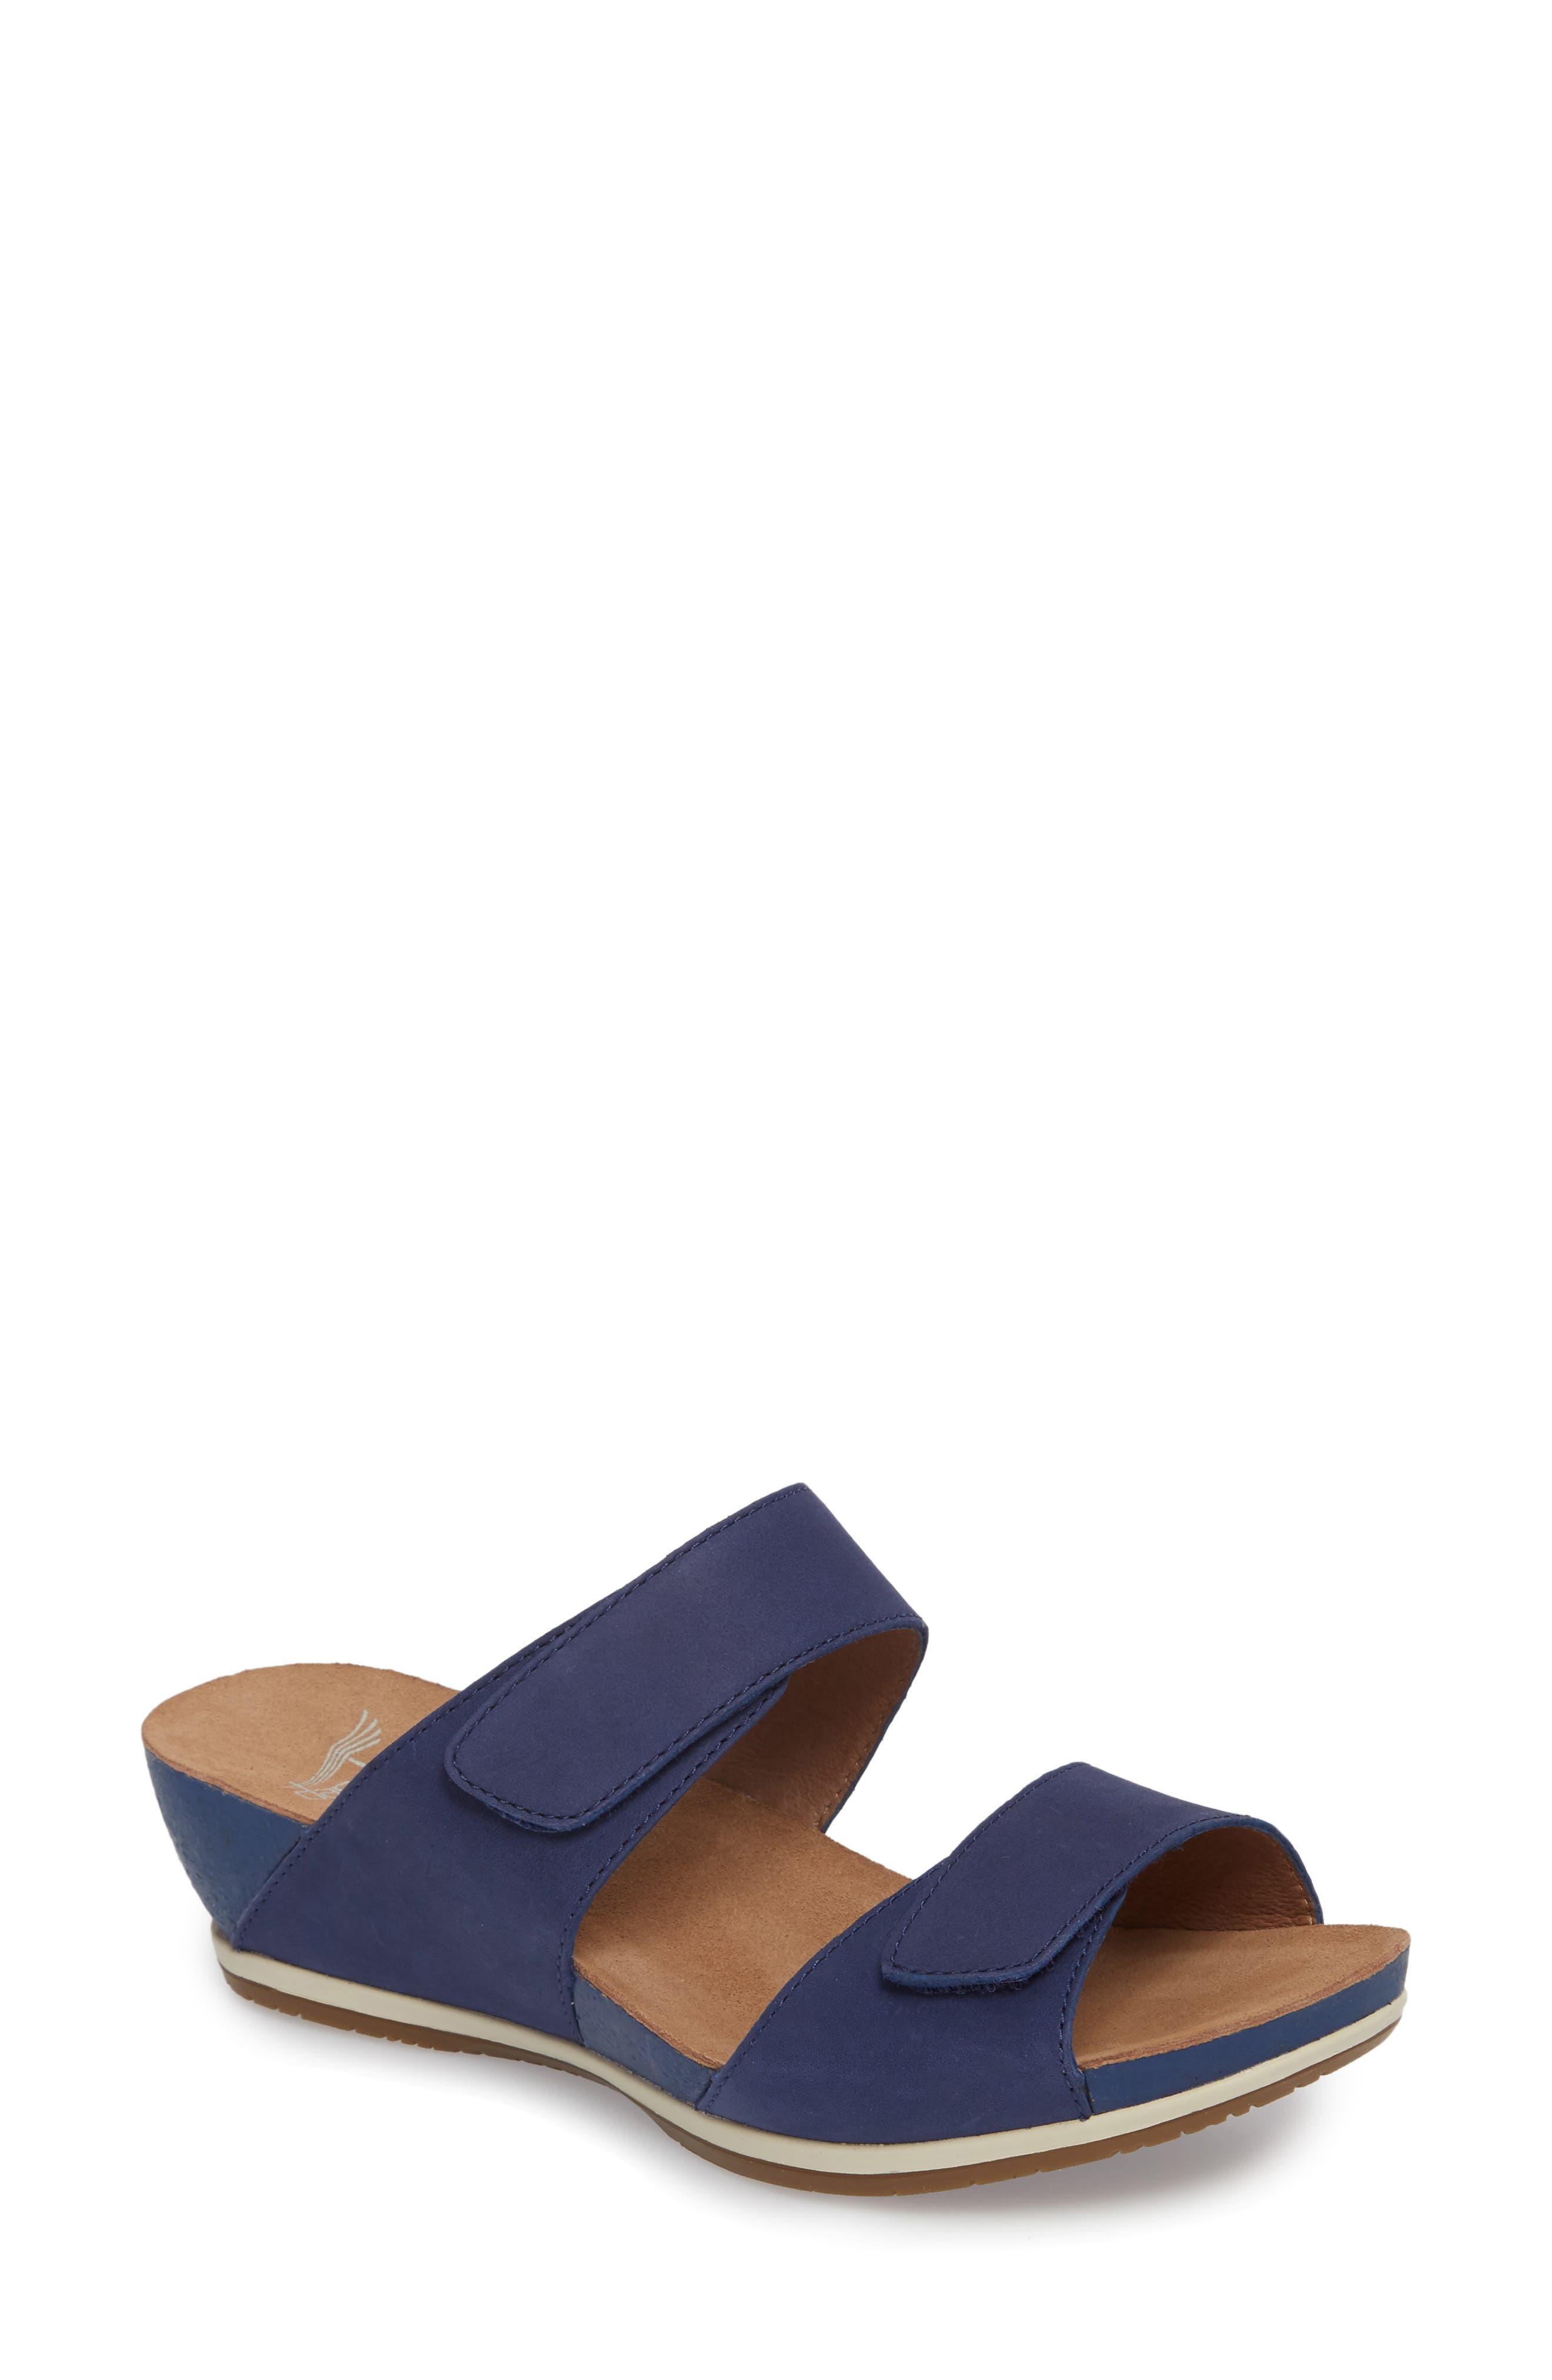 Vienna Slide Sandal,                             Main thumbnail 1, color,                             Blue Milled Nubuck Leather